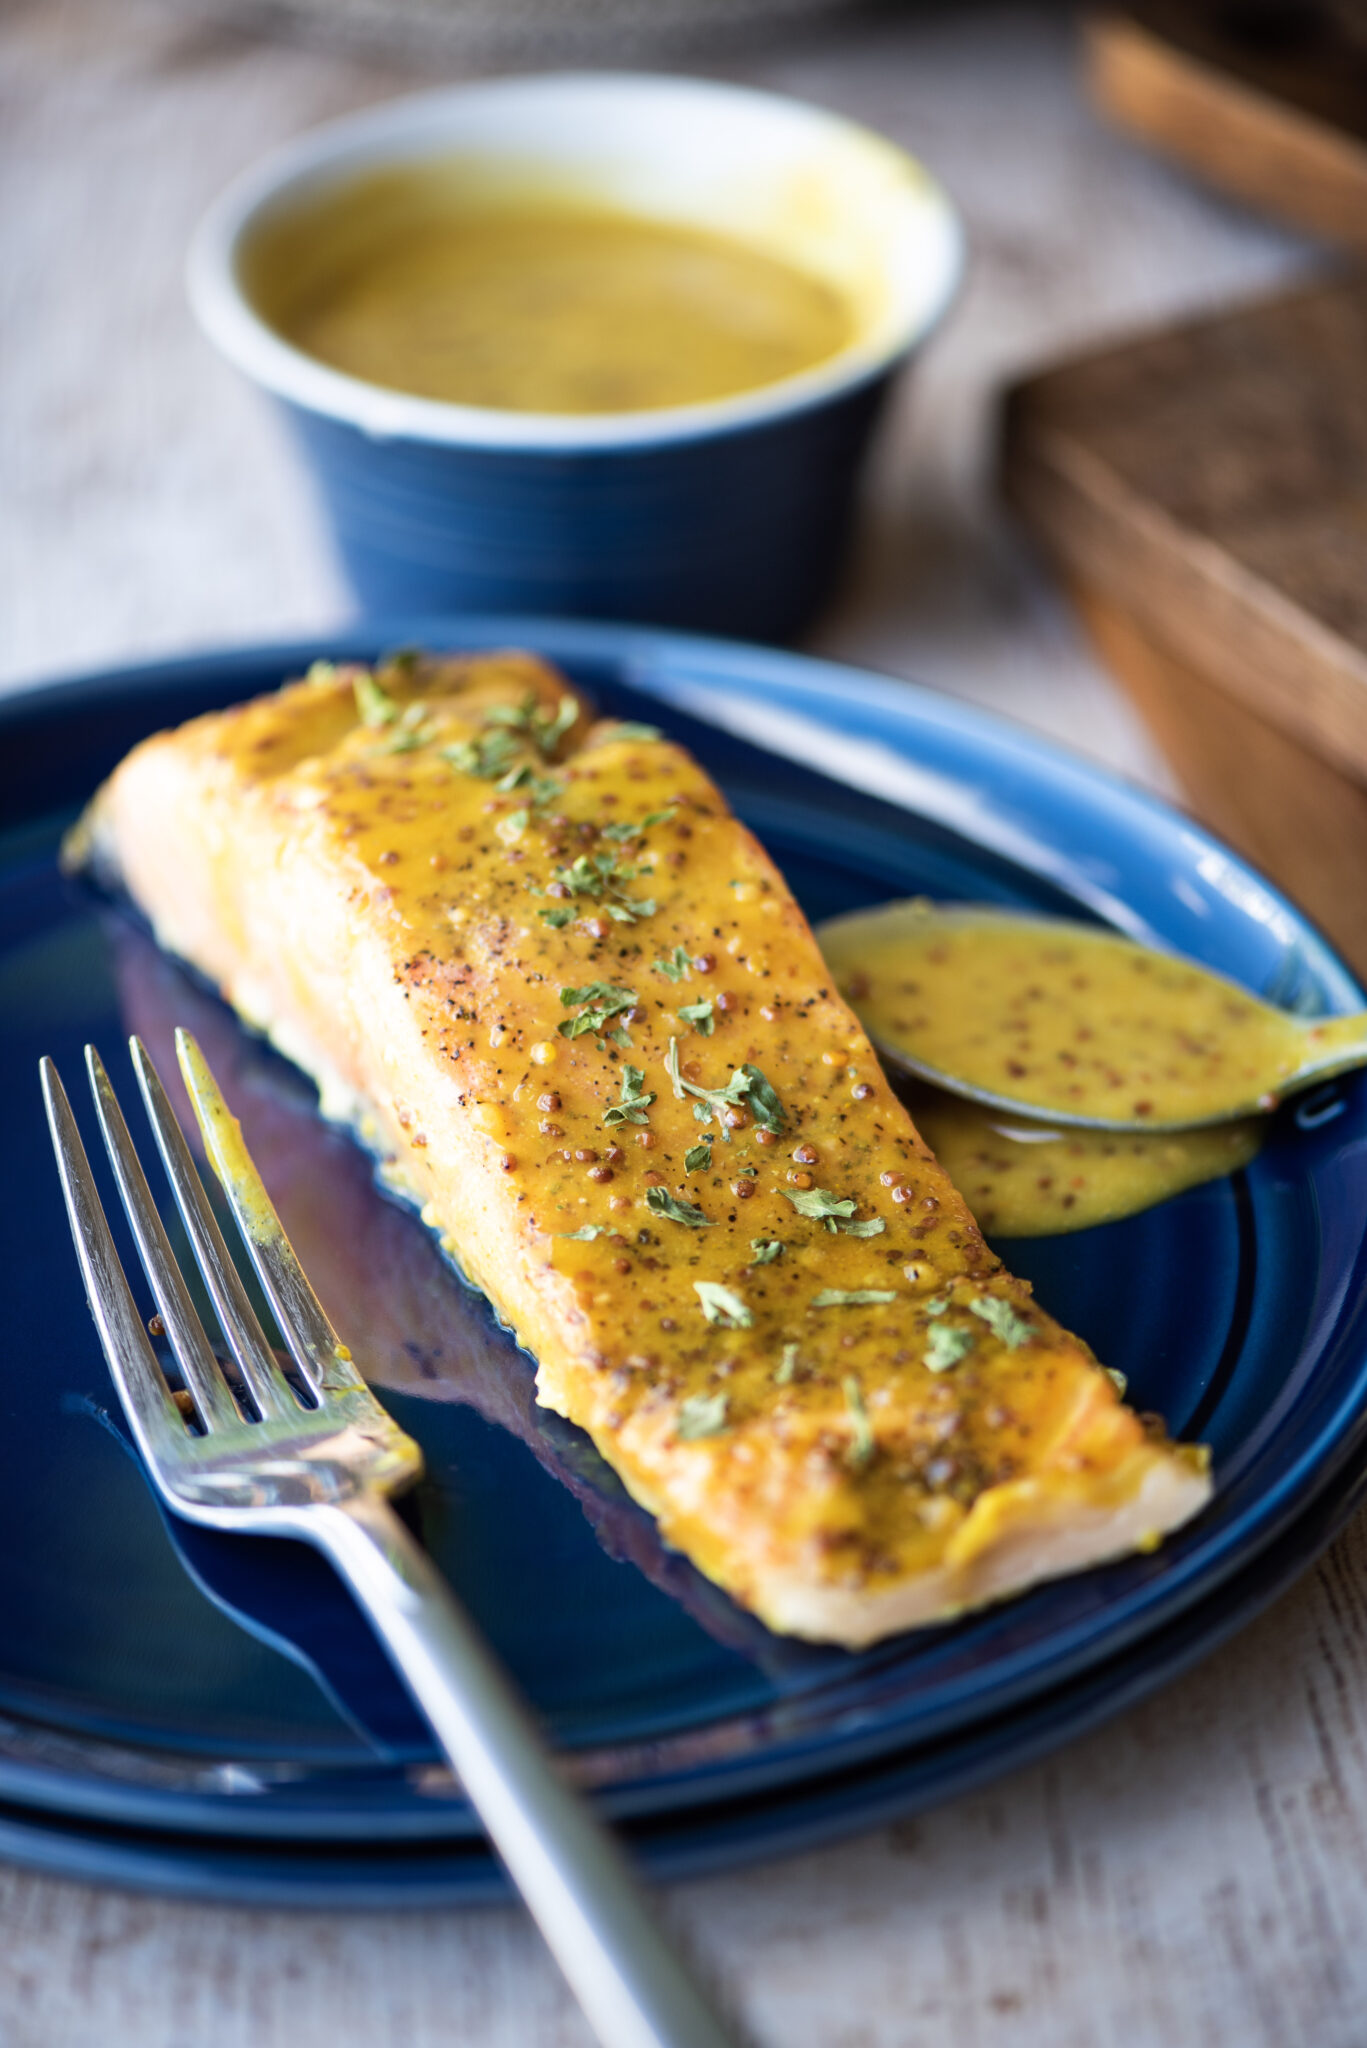 Single piece of honey-mustard salmon